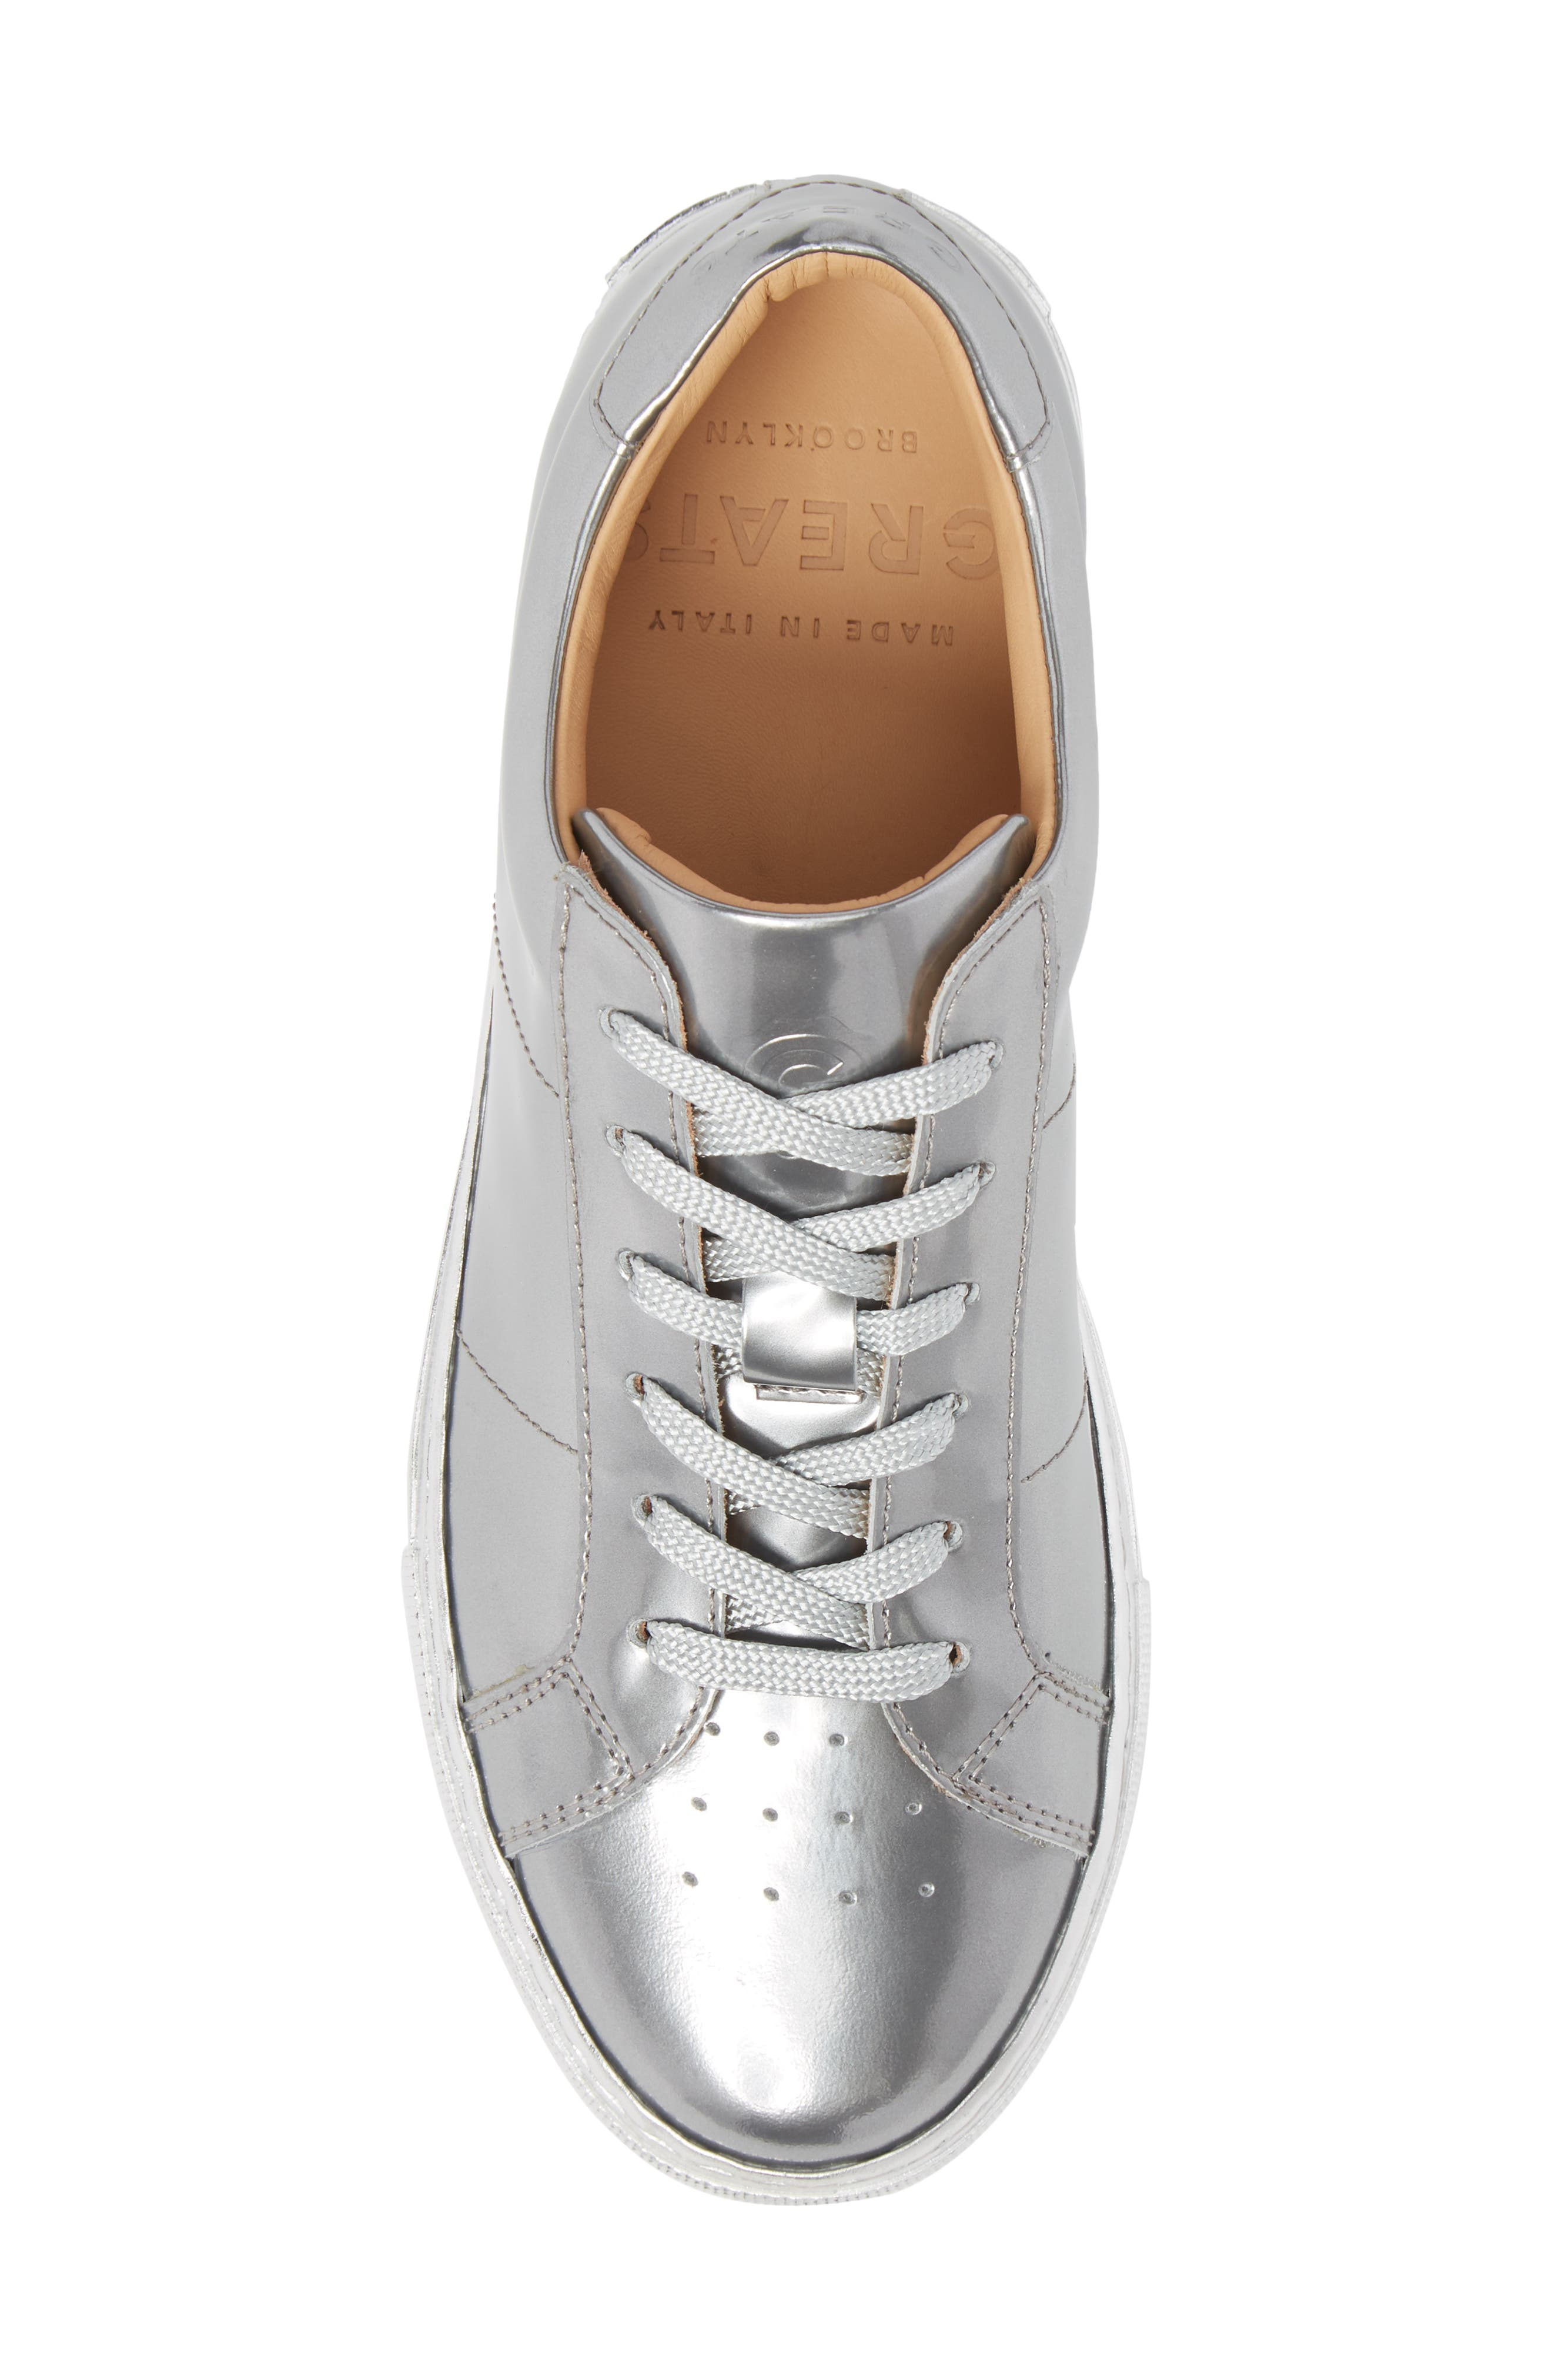 Royale Low Top Sneaker,                             Alternate thumbnail 5, color,                             Silver Tonal/ Flat Leather